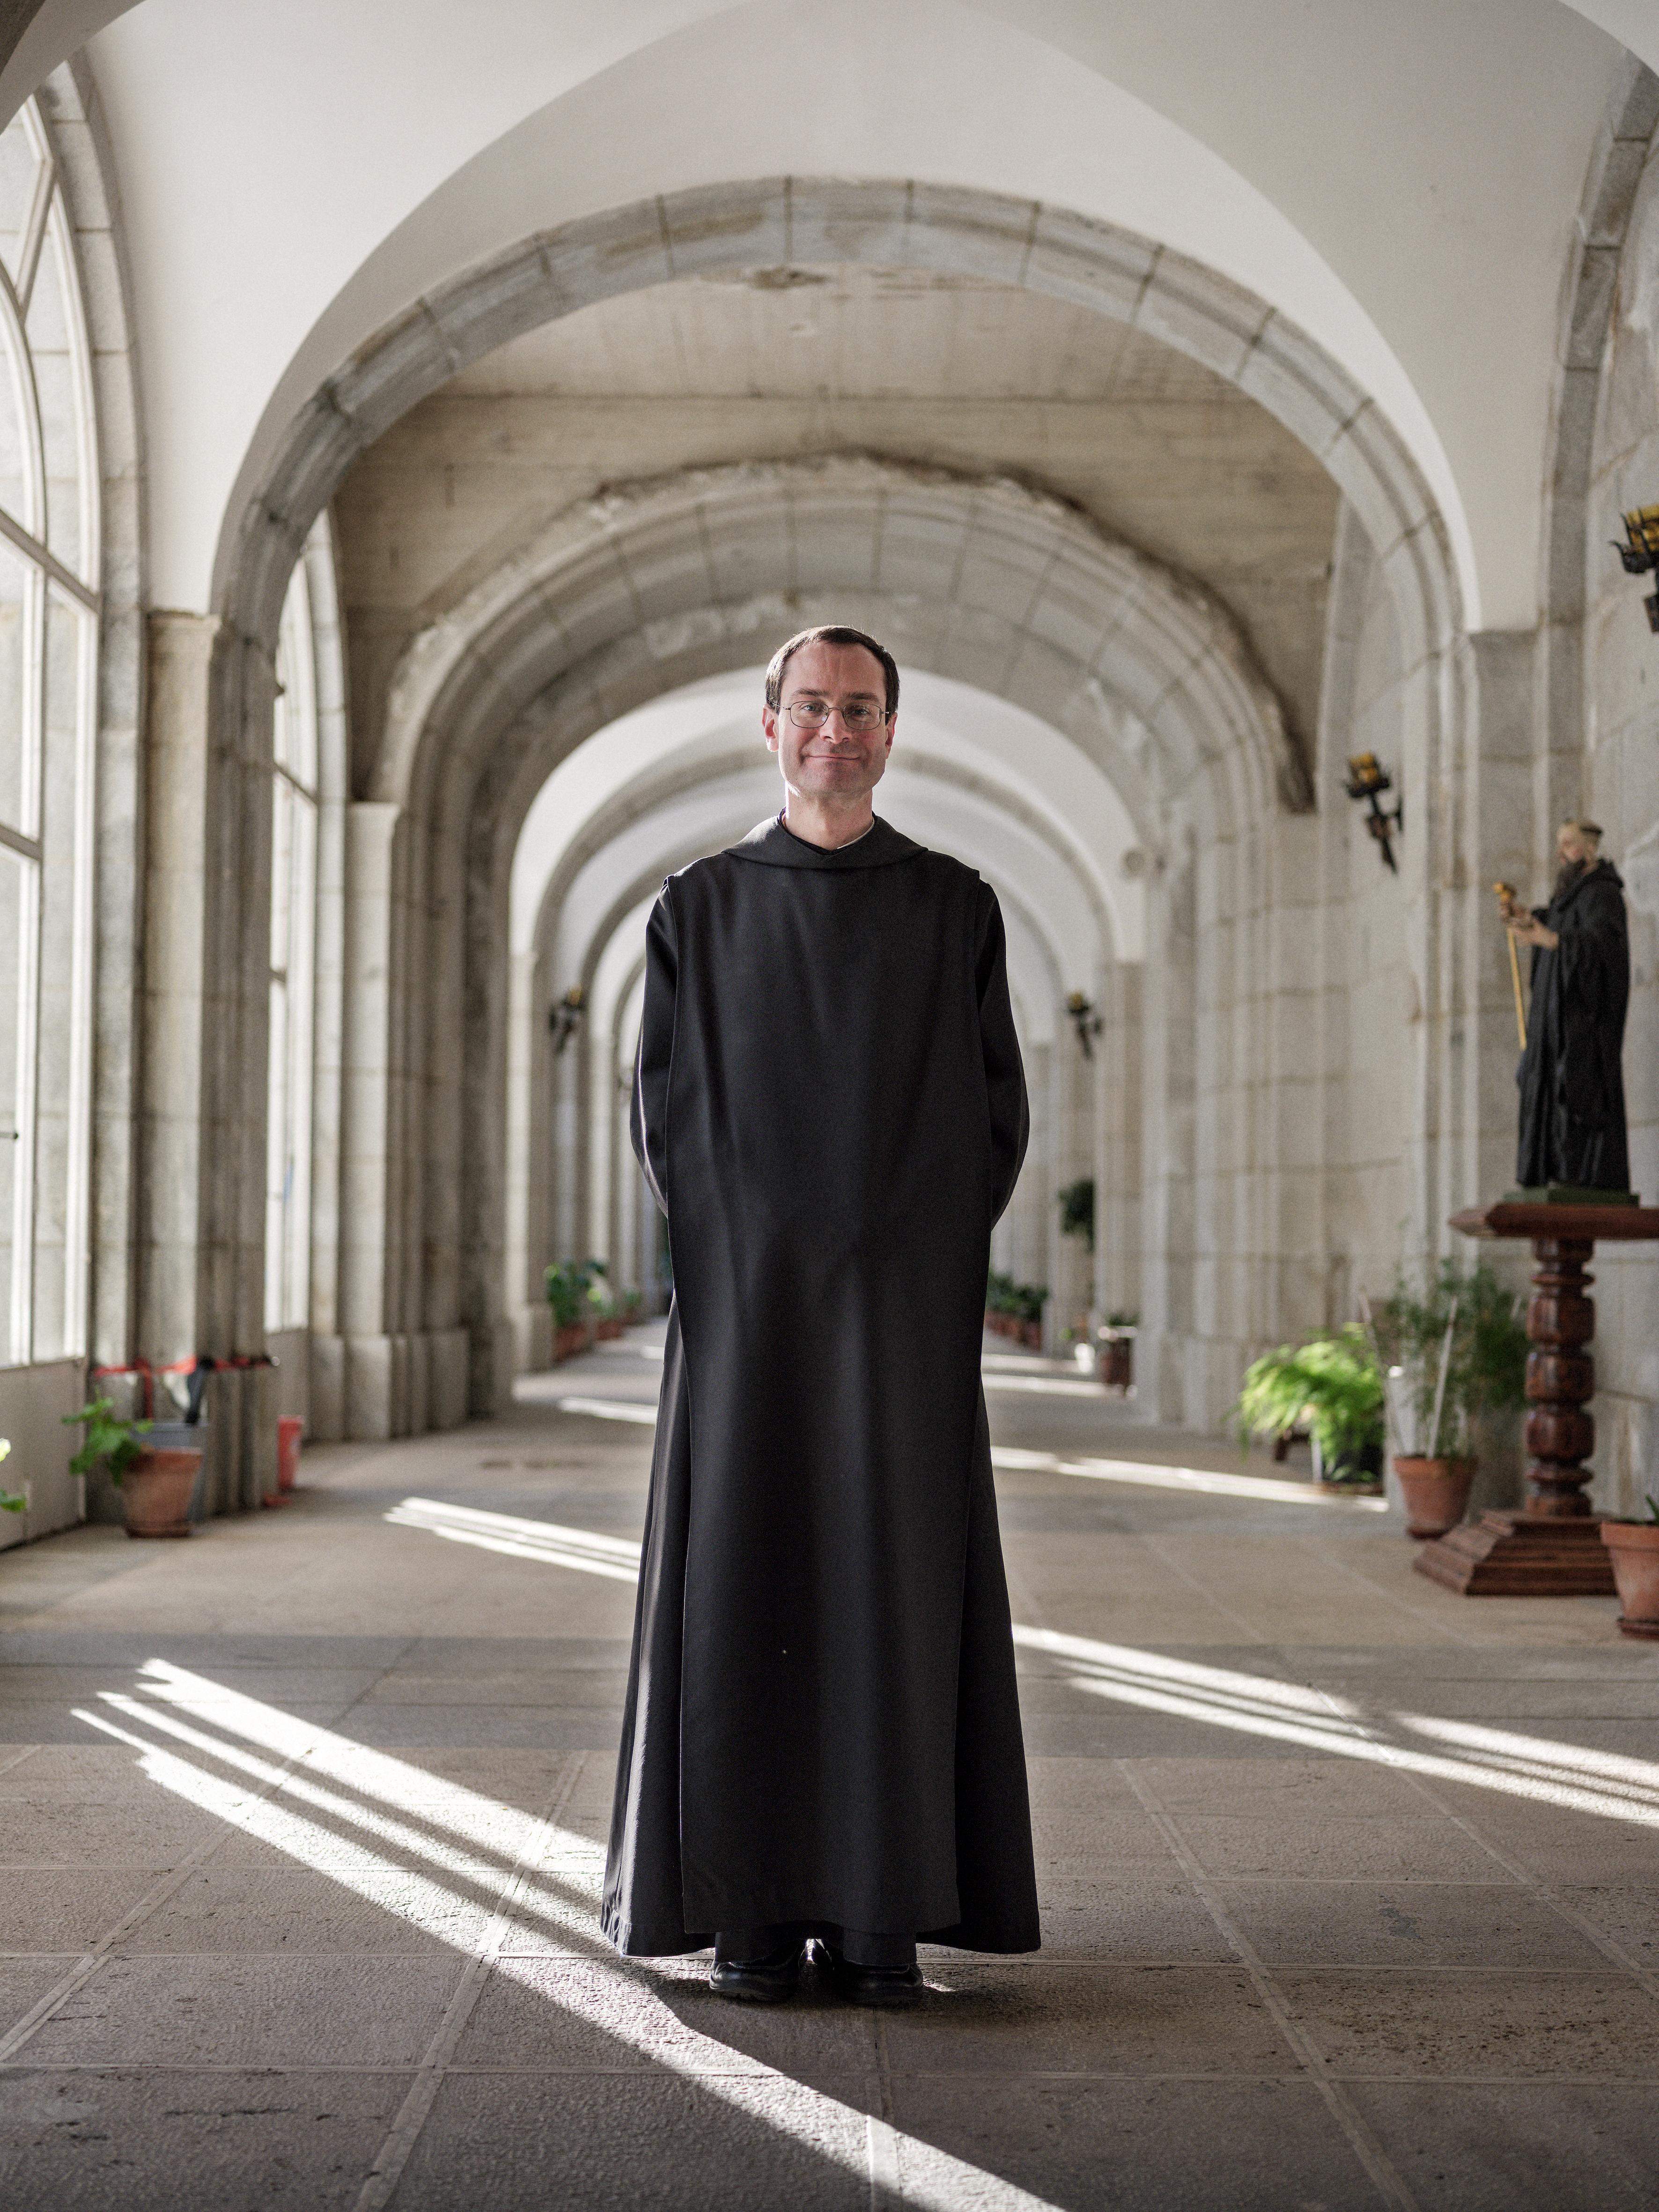 Father Santiago Cantera's opposition